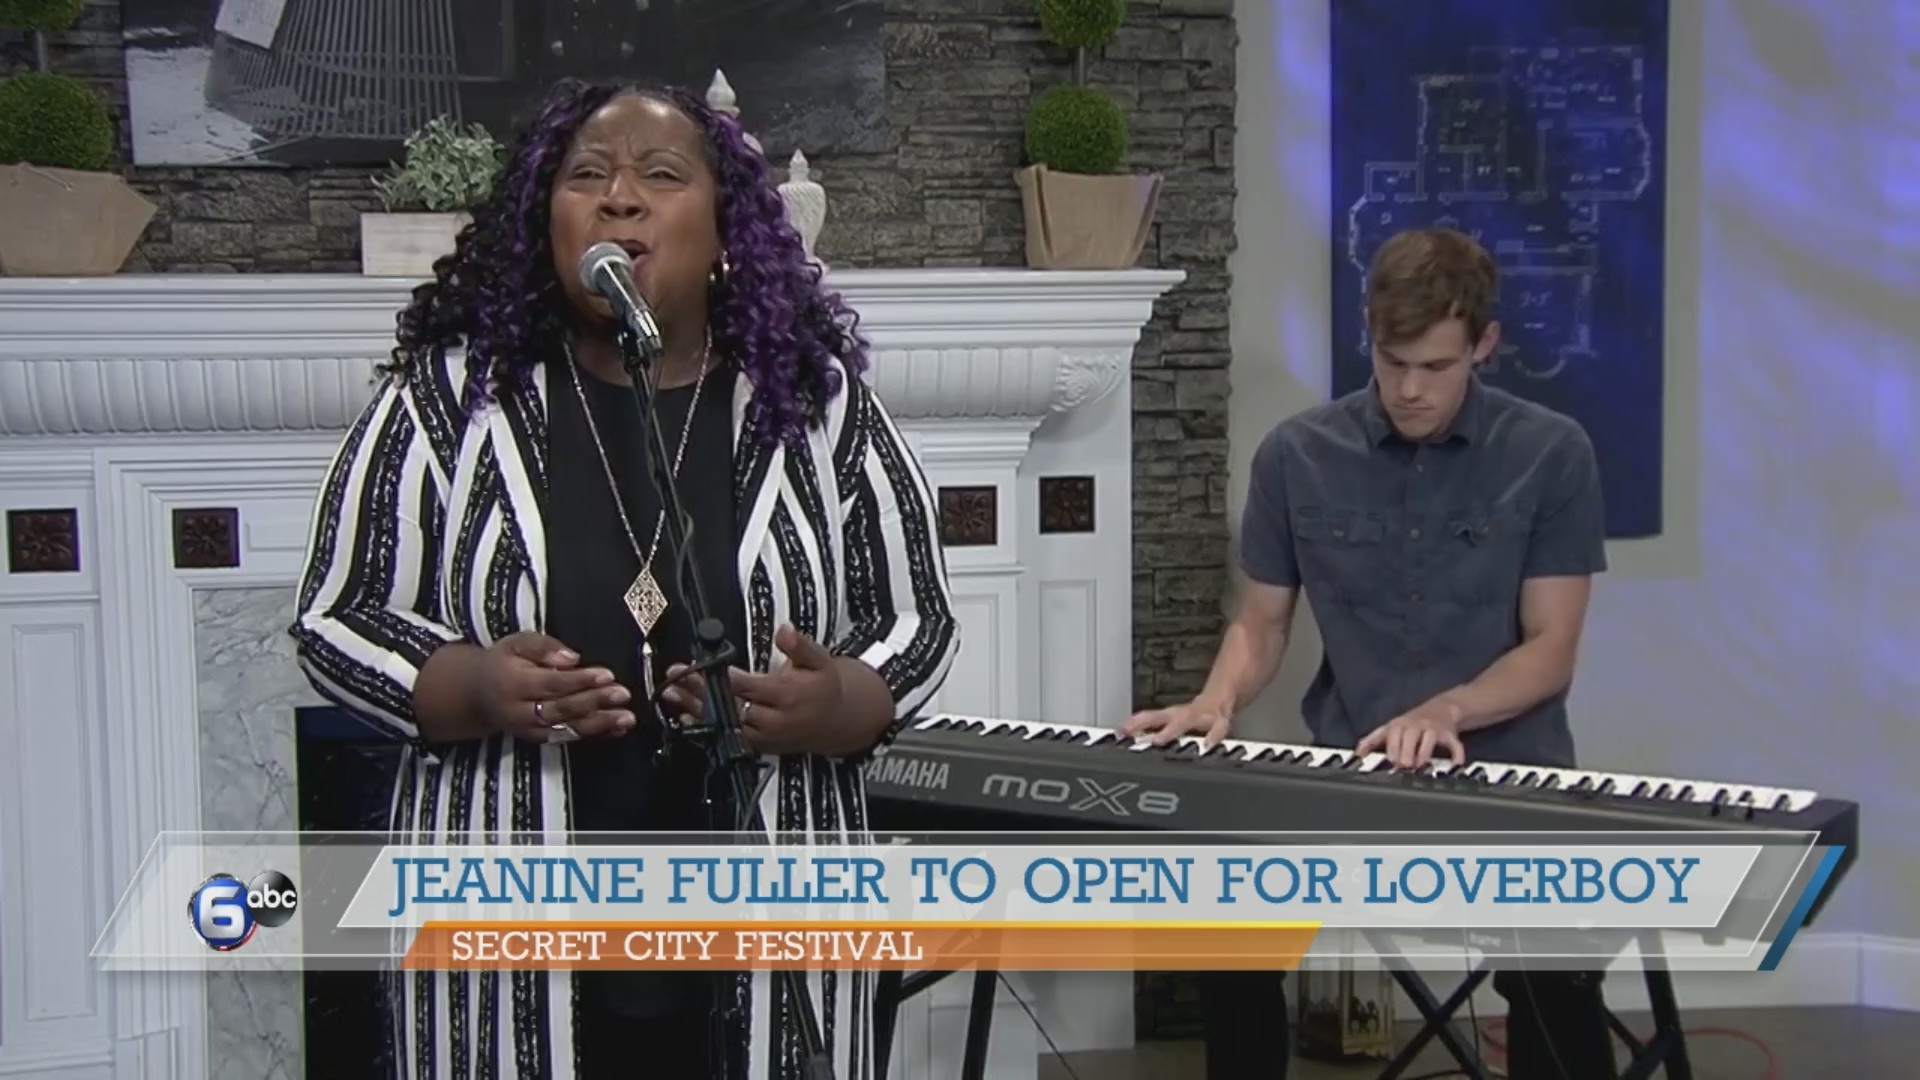 Jeanine Fuller to open for Loverboy